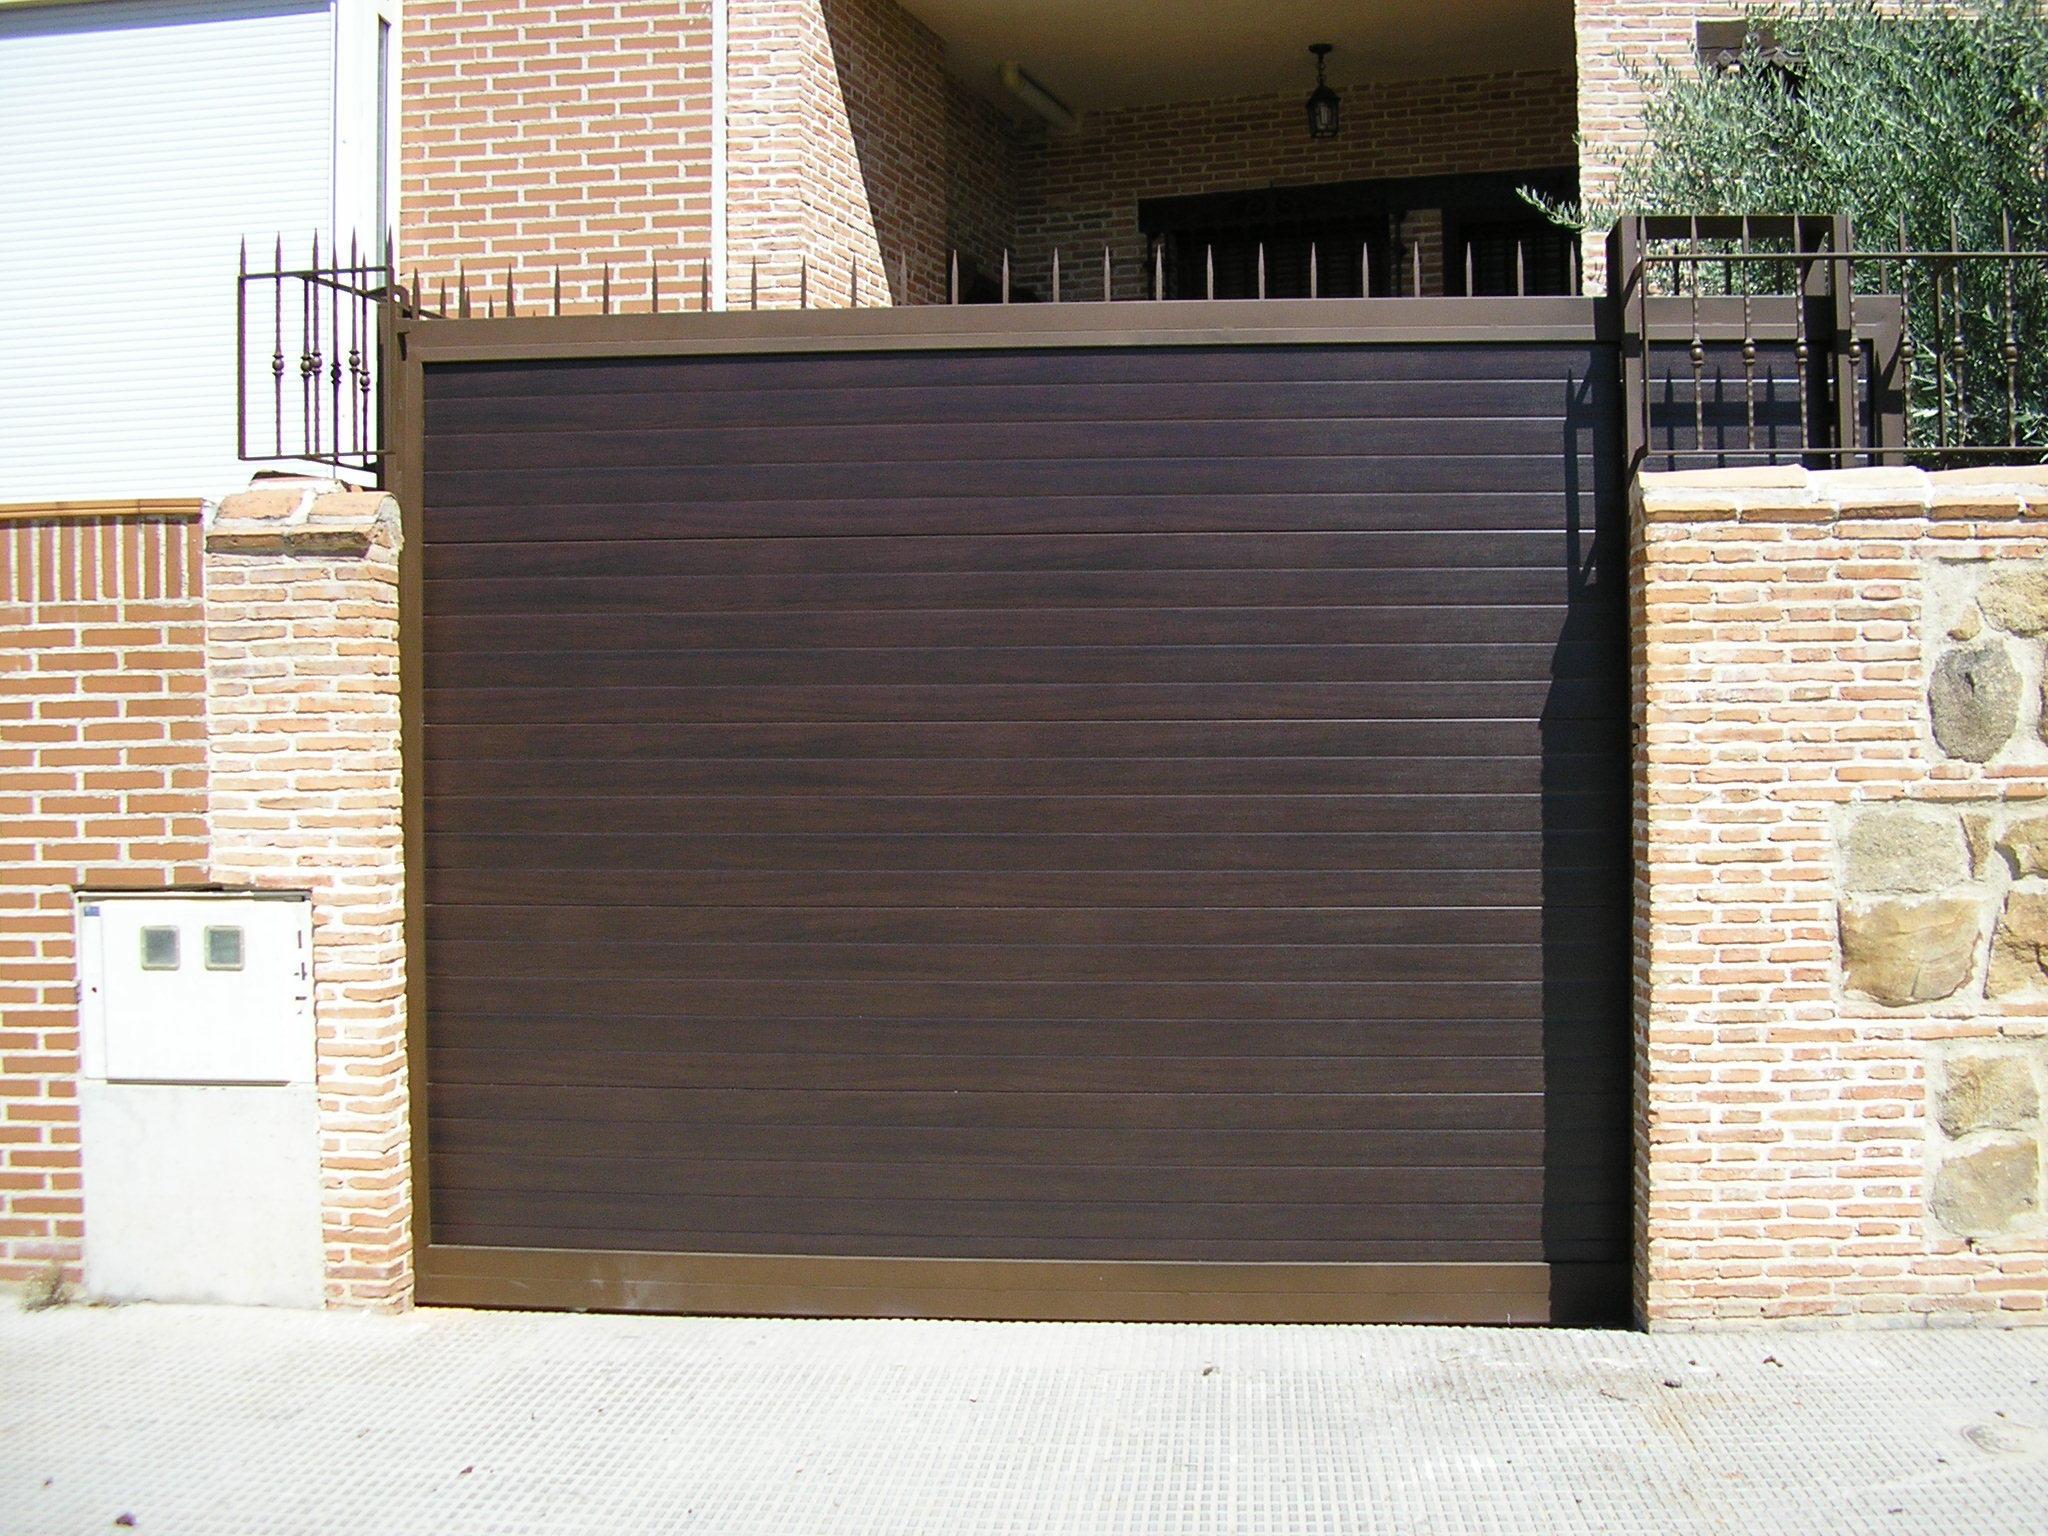 Puertas for Puertas para fincas